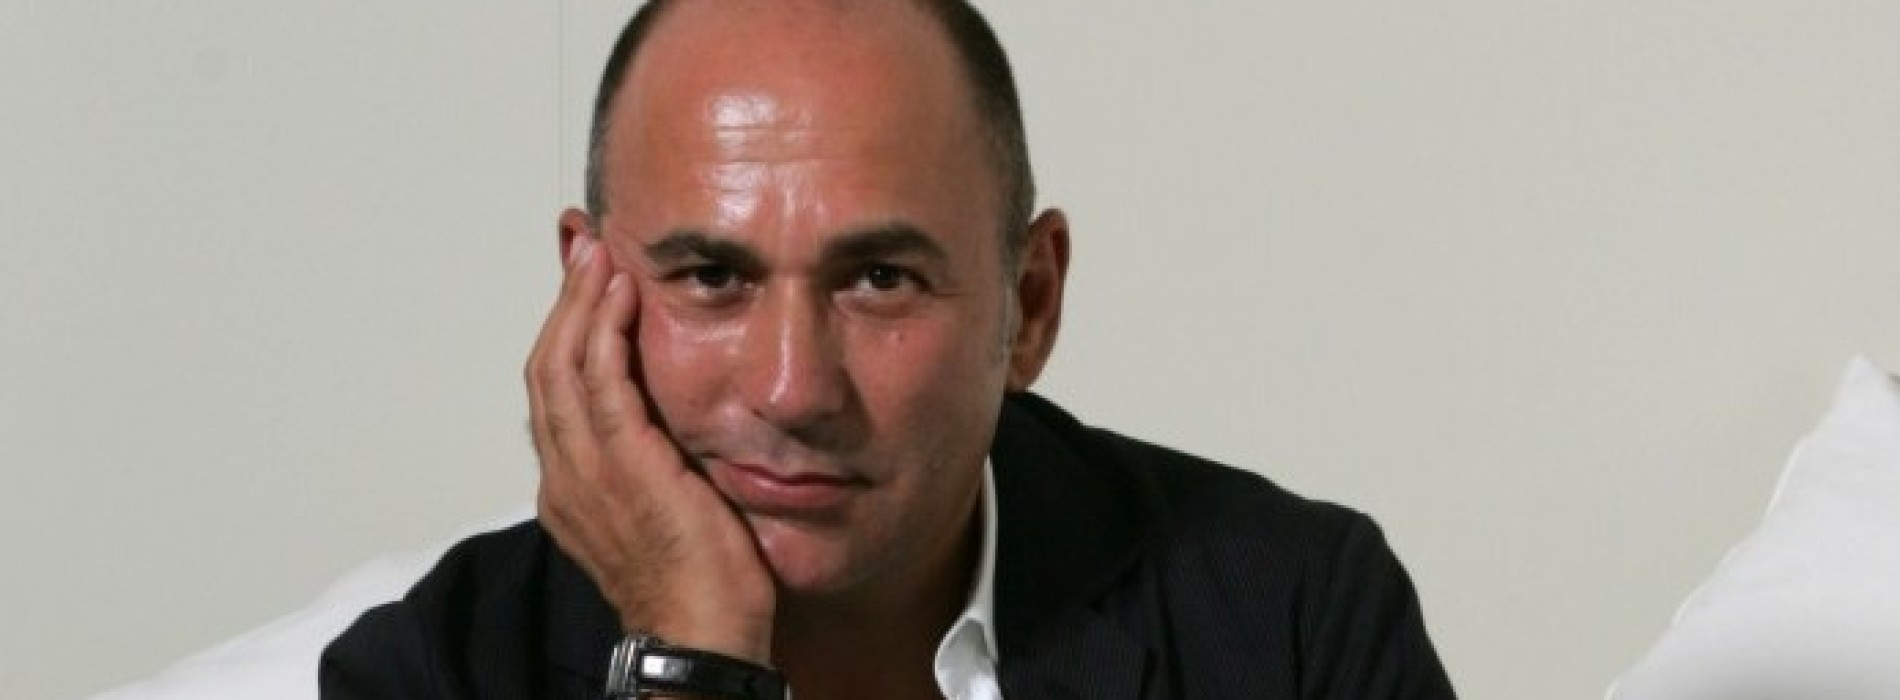 Maestri alla Reggia, Ferzan Özpetek tra cinema e teatro